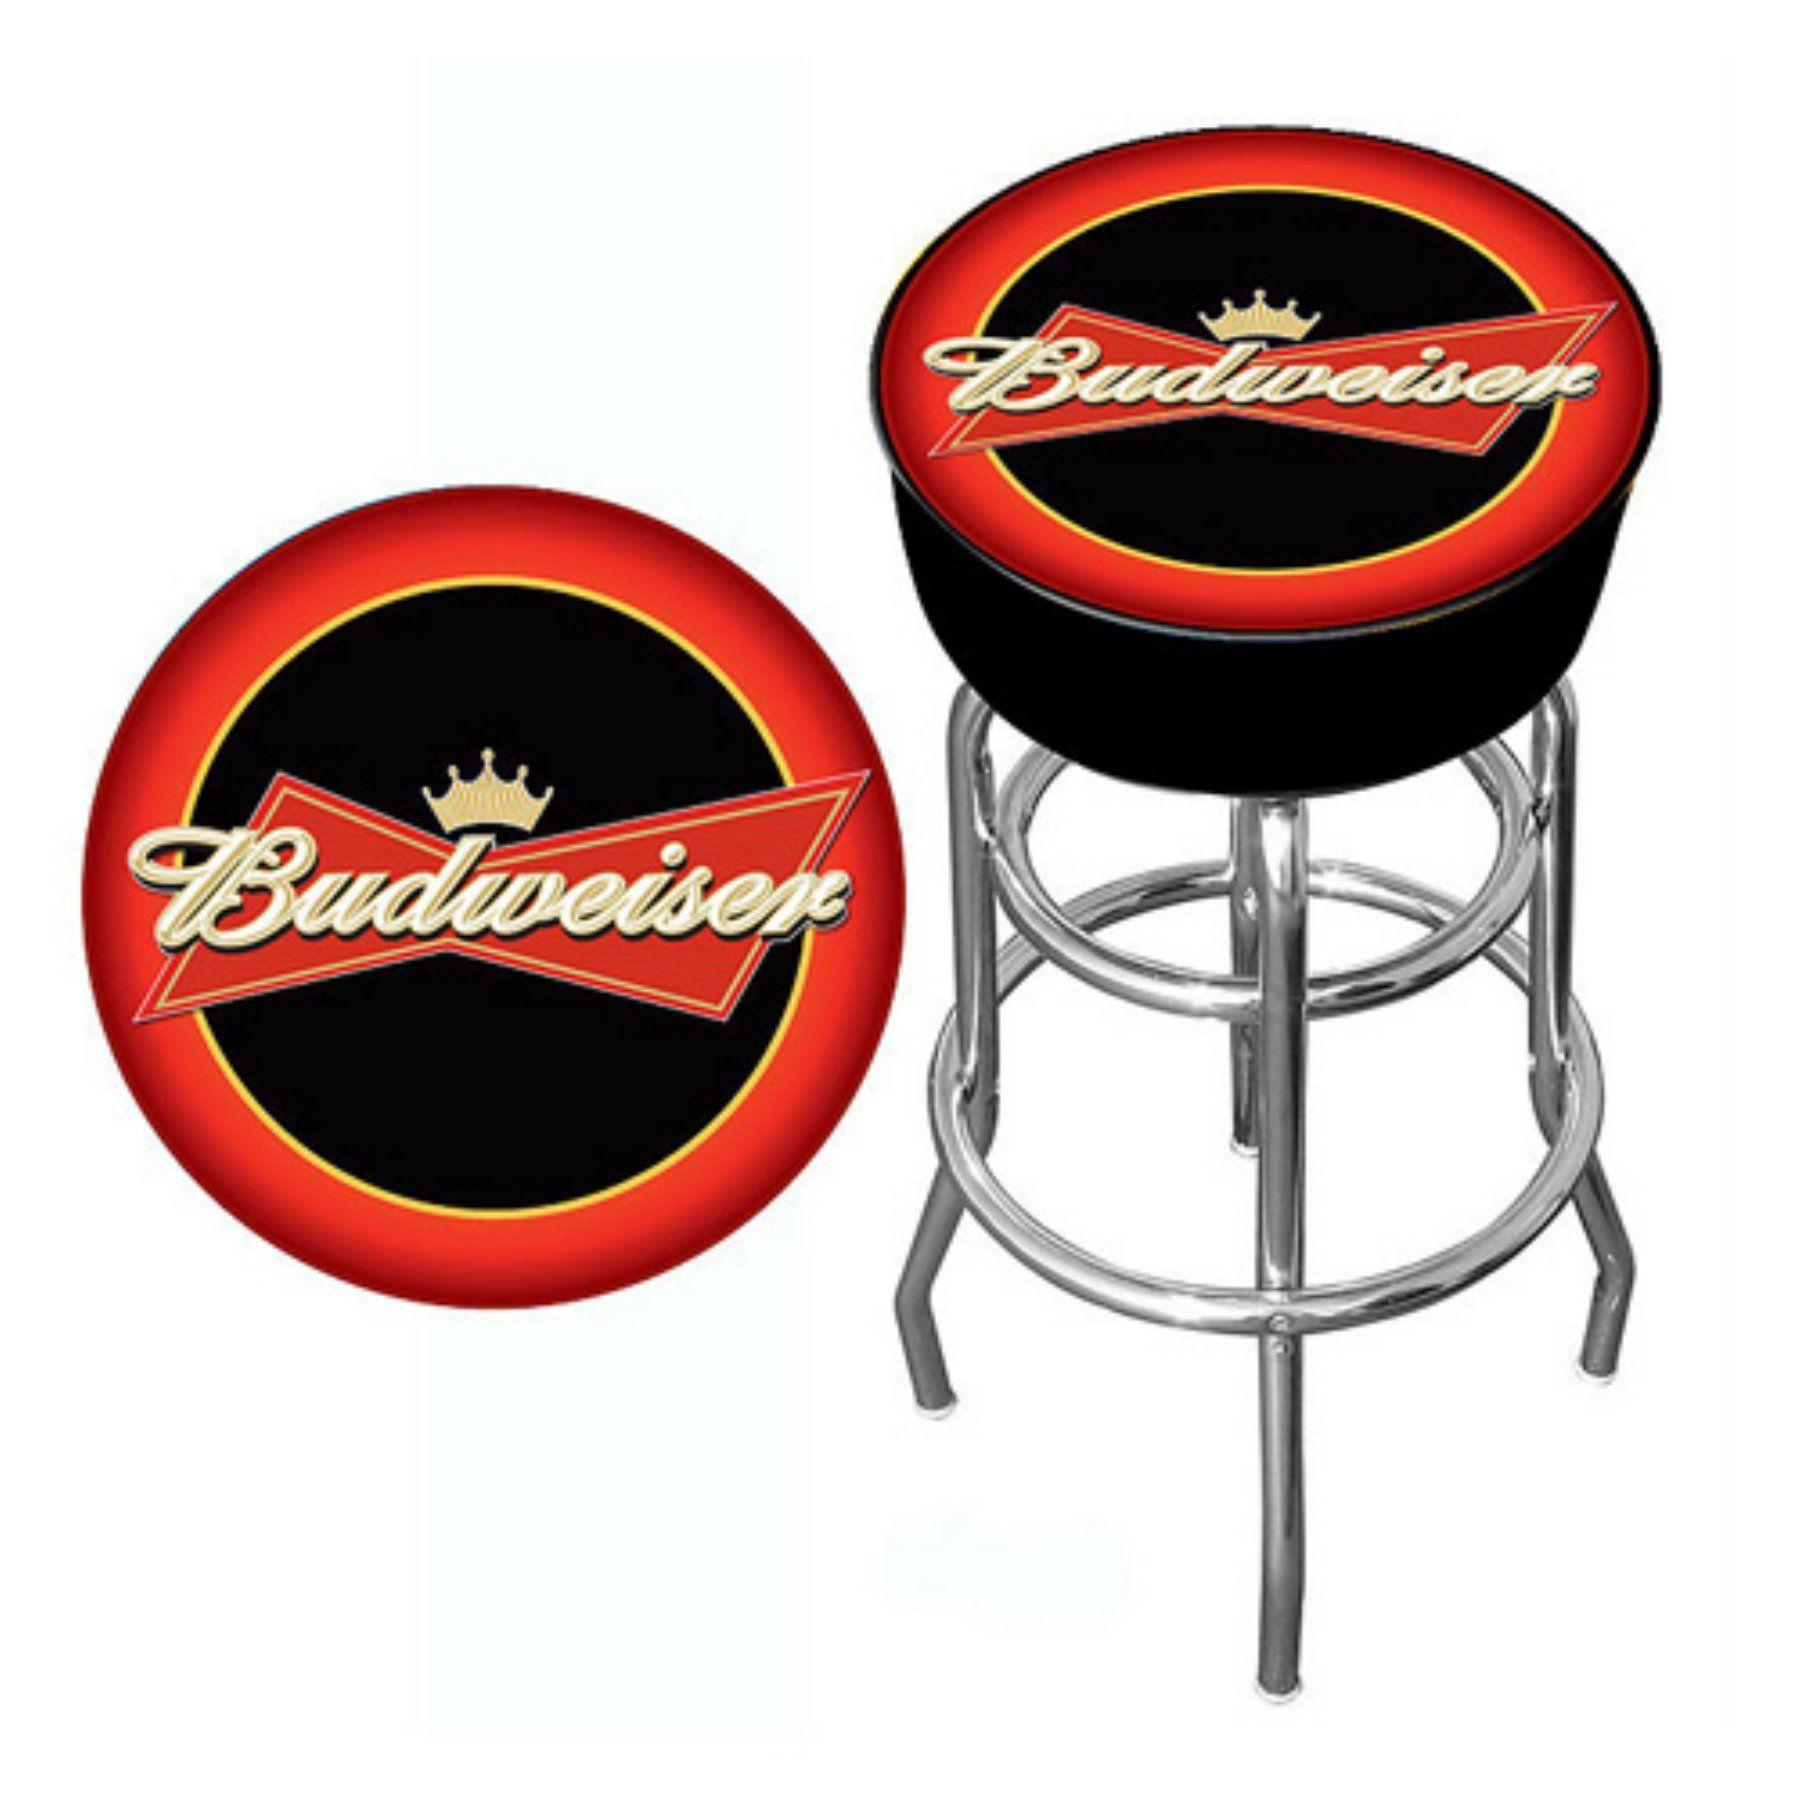 Trademark Budweiser Bar Stool Ab1000 Bud Bar Furniture For Sale Black Bar Stools Home Bar Furniture